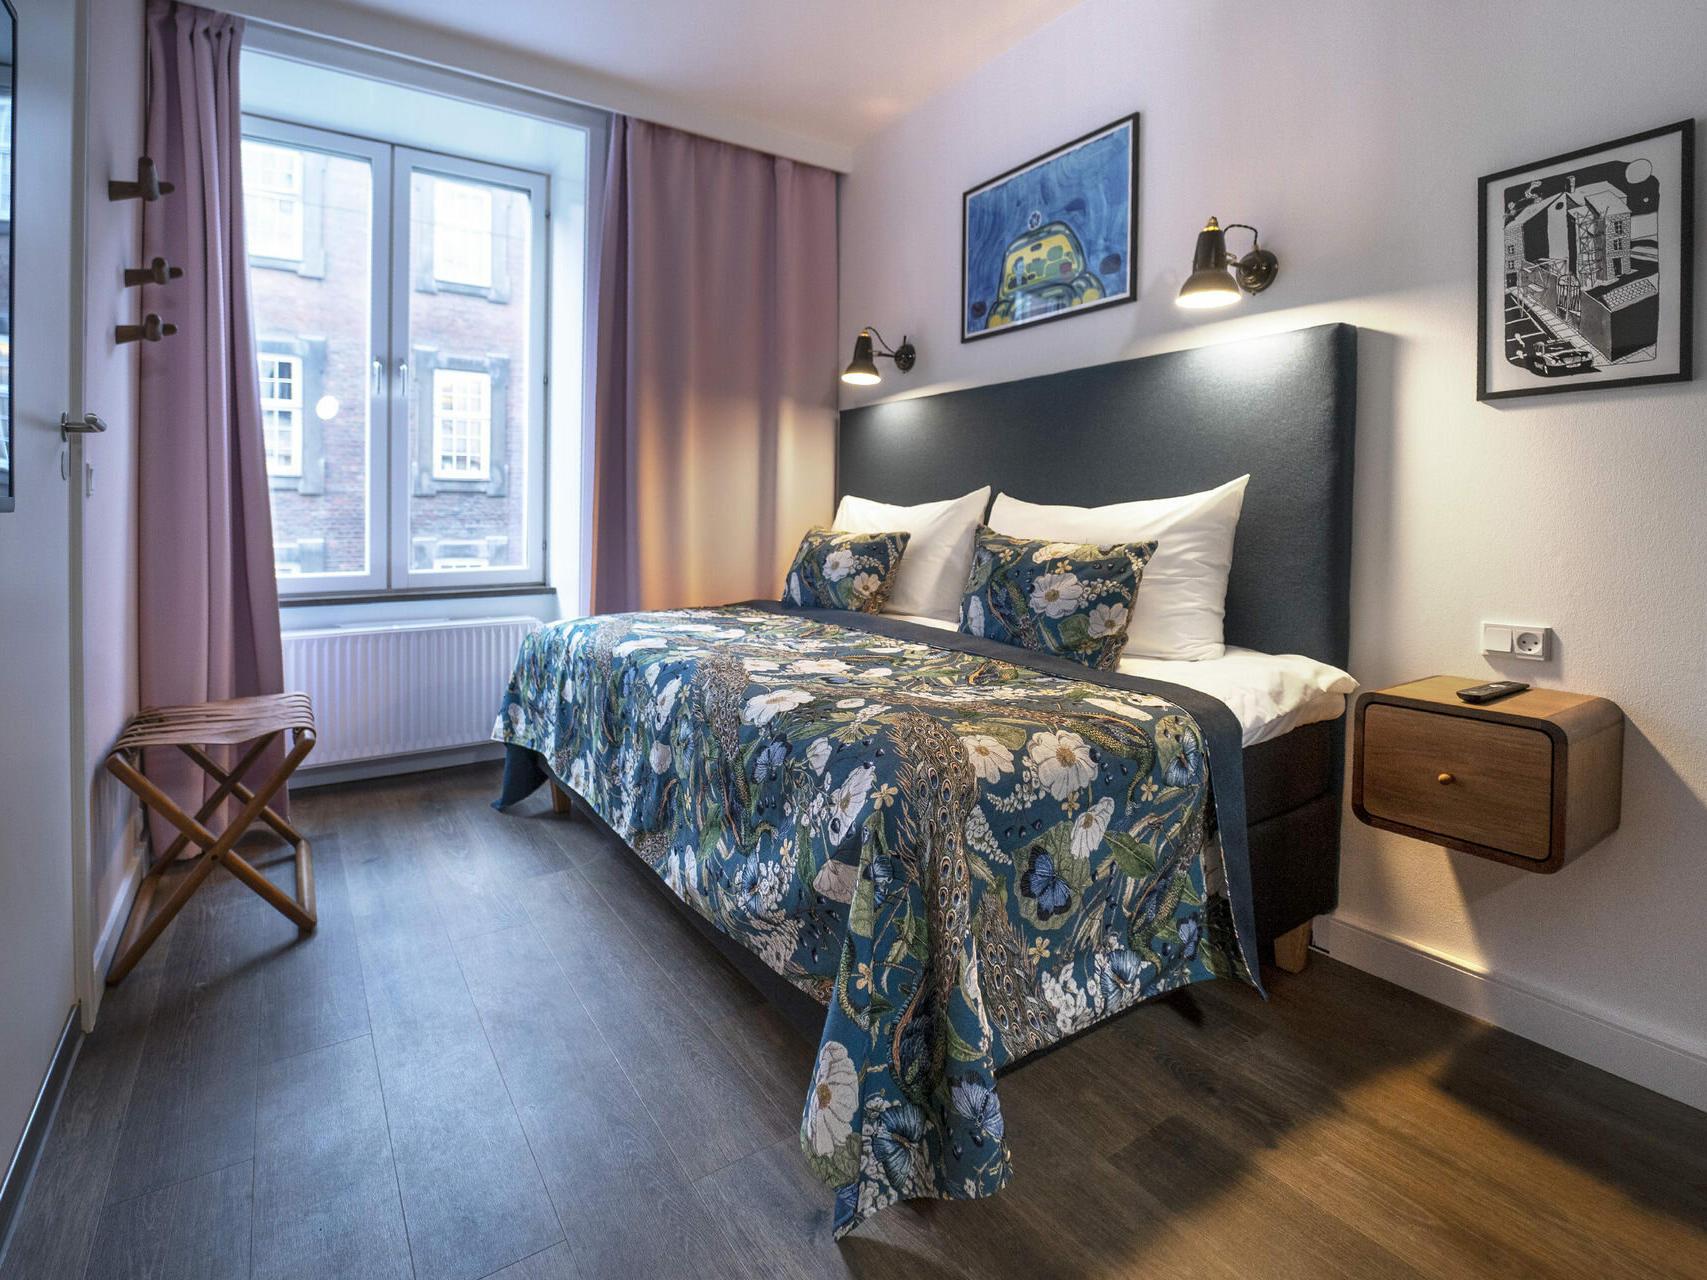 Solo - Single room at hotel h27 Copenhagen